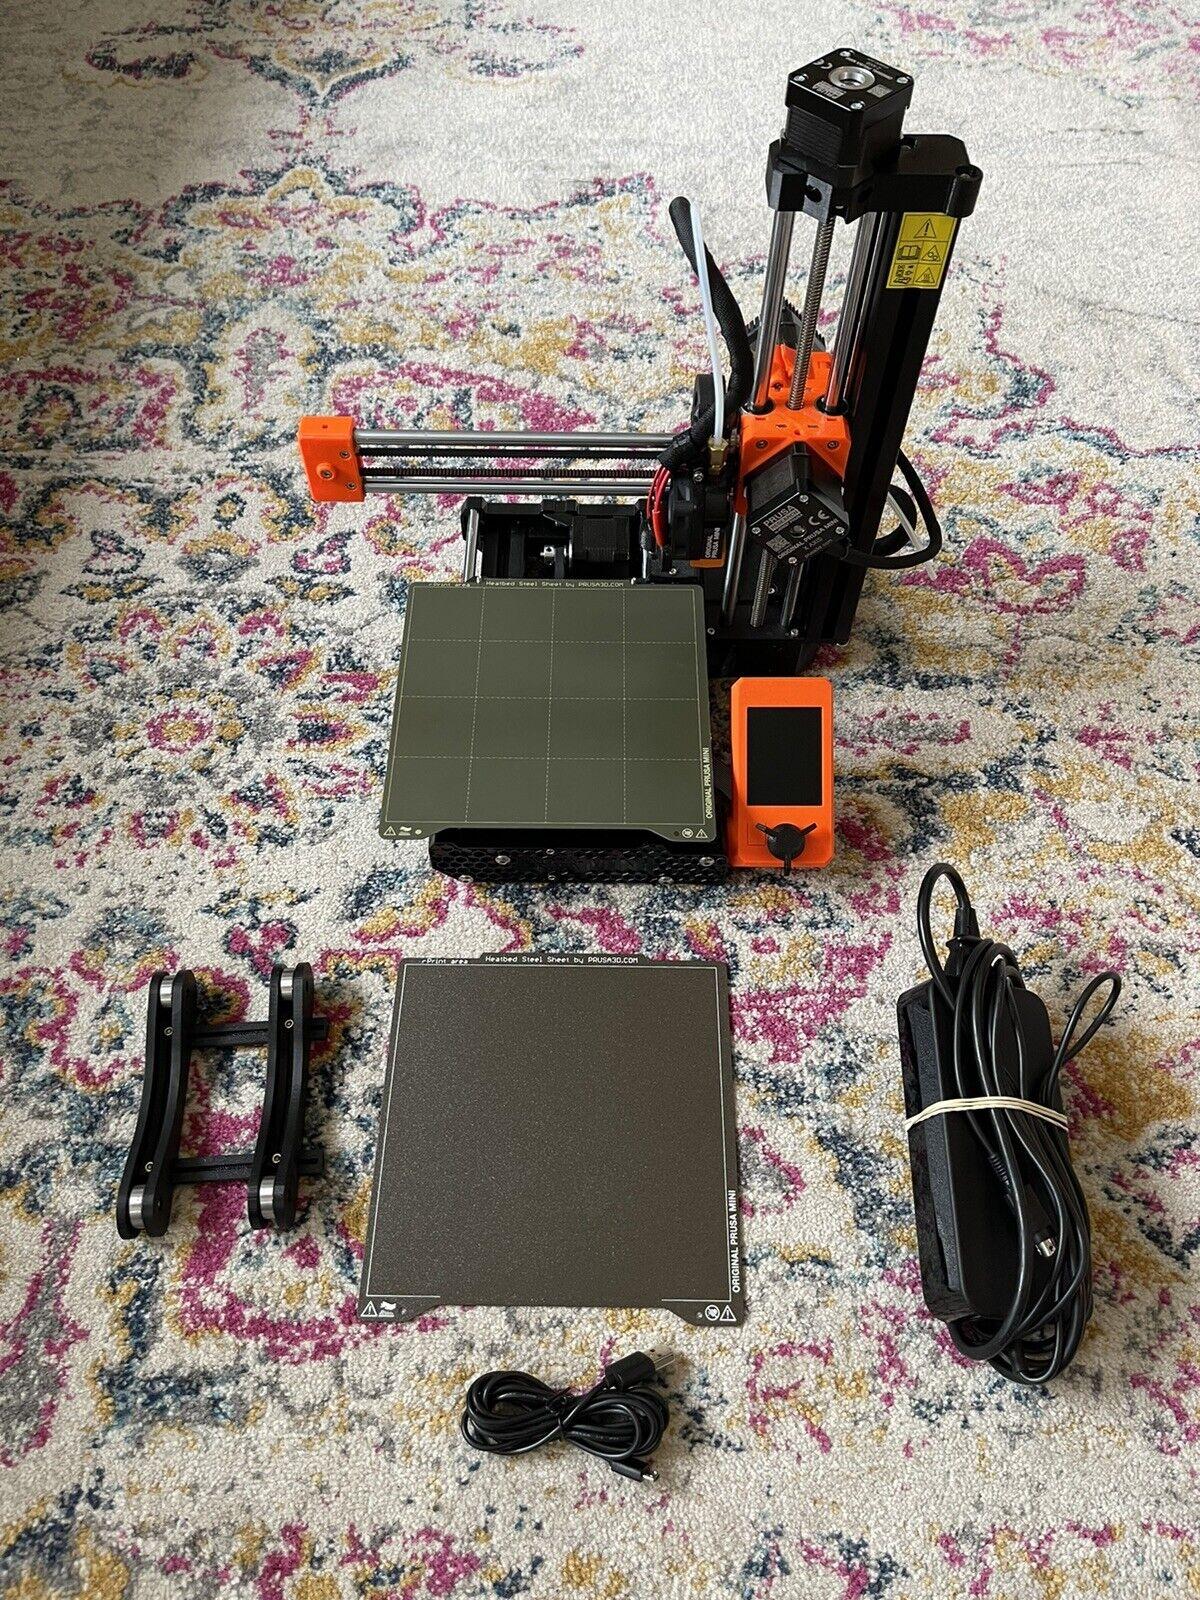 Original Prusa Mini+ 3D Printer + Textured & Smooth Double Sided PEI Sheet